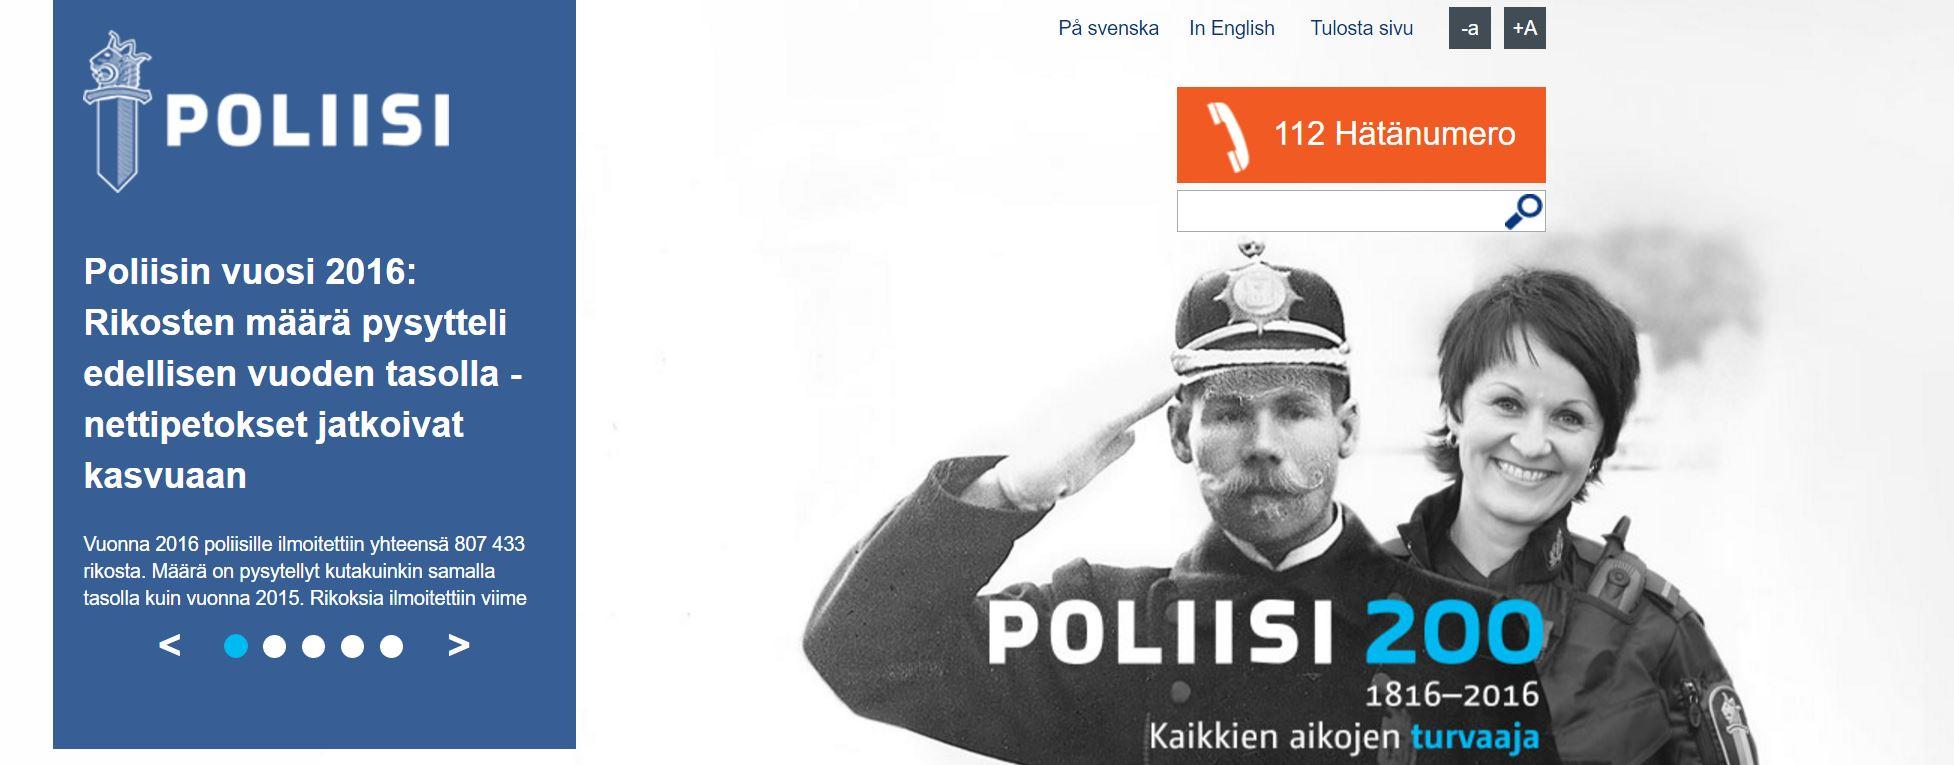 poliisicreenshot